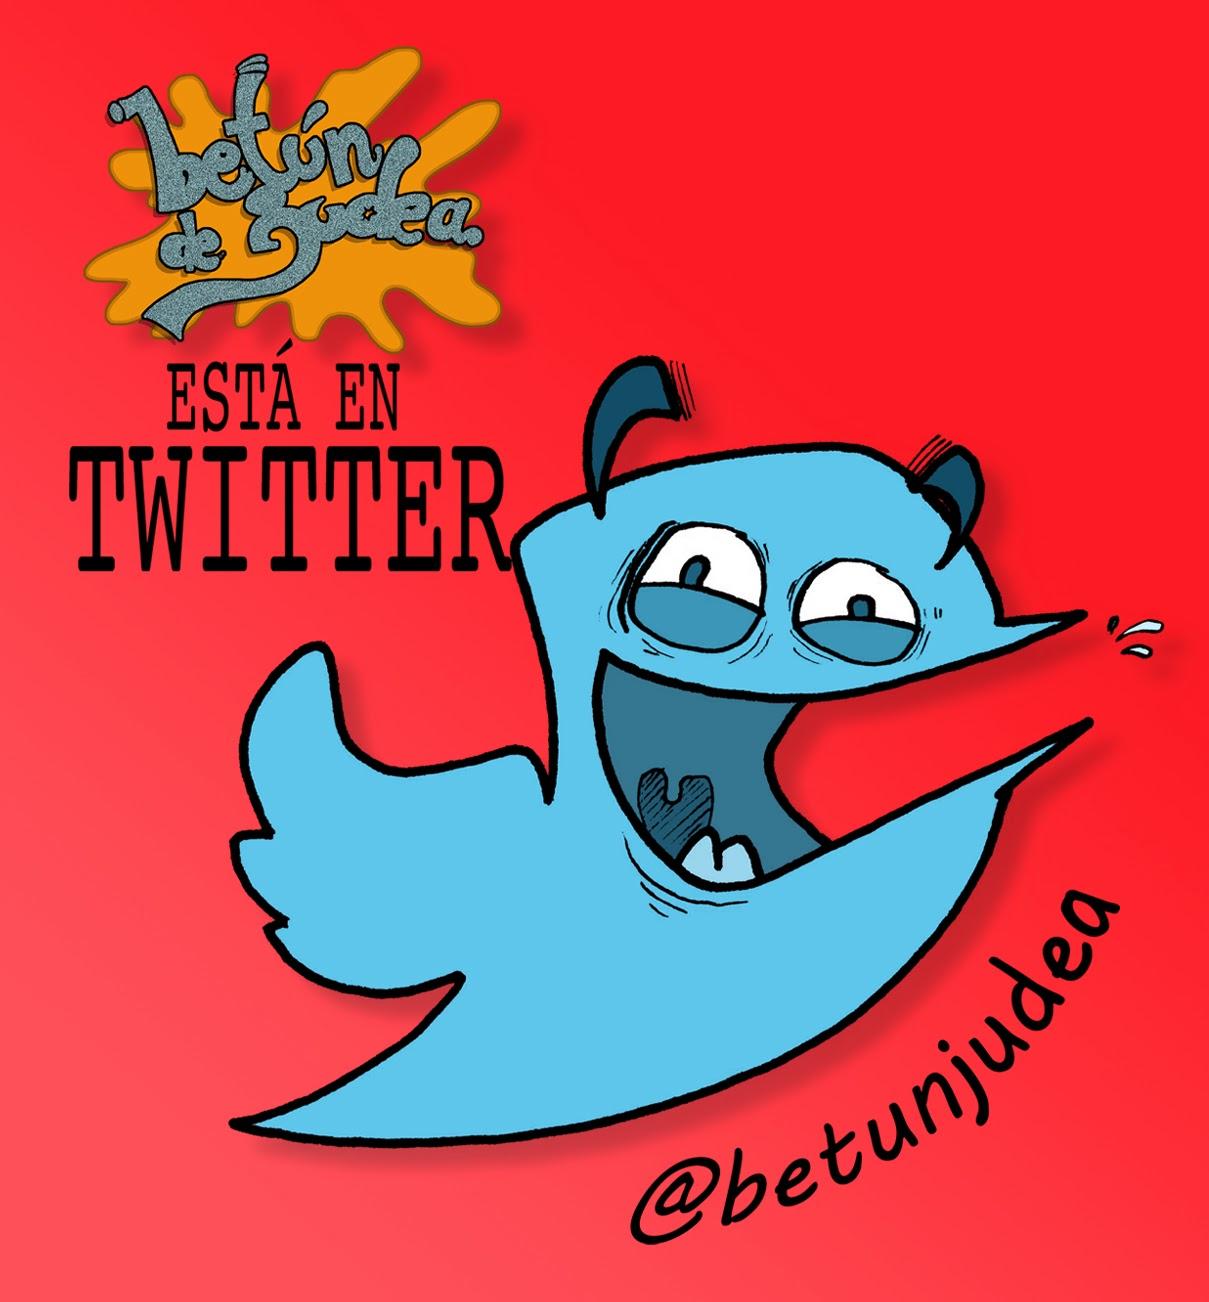 Betún de Judea está en Twitter